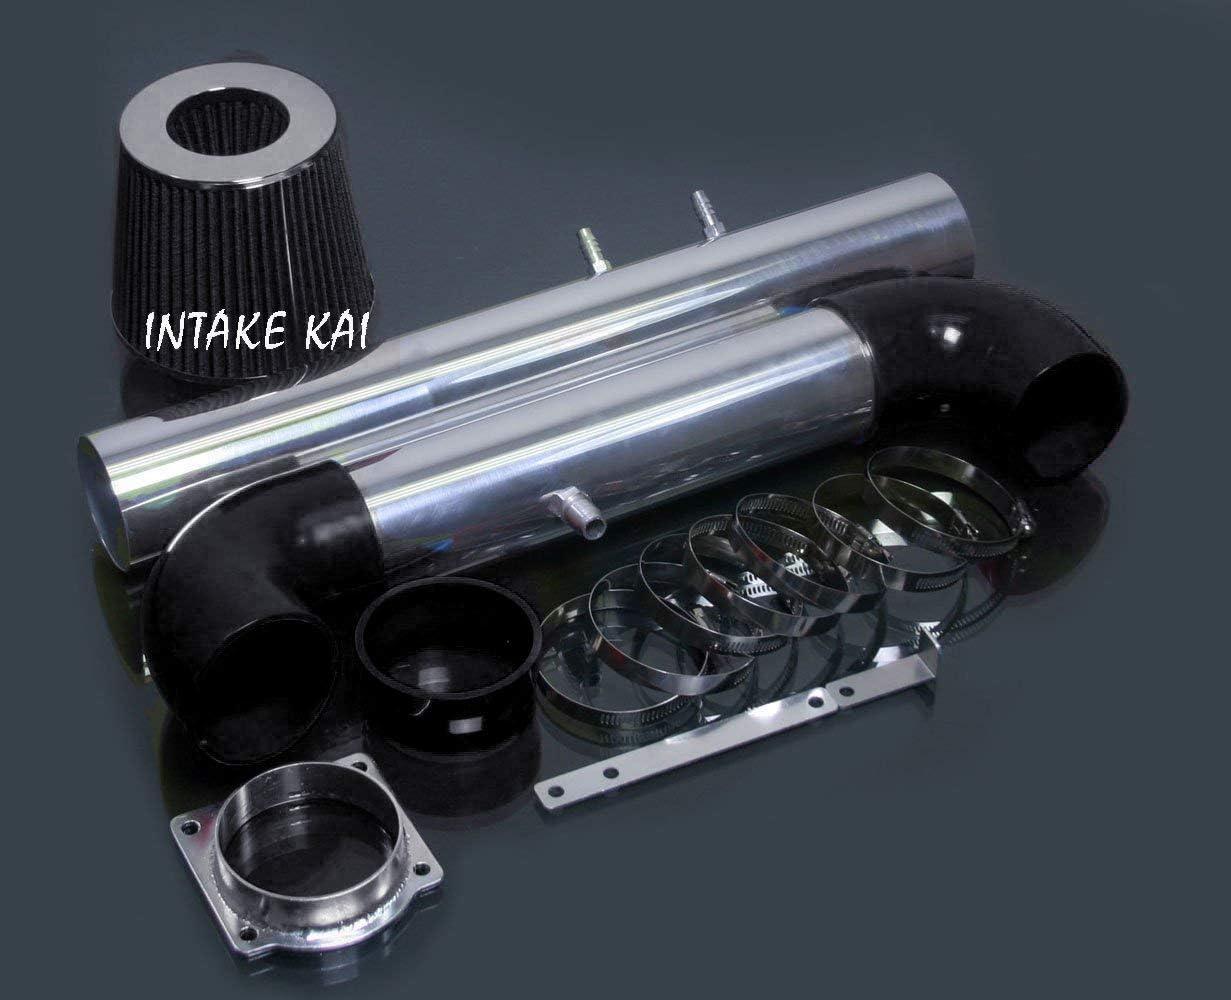 FILTER FOR 2000-2002 LINCOLN LS 3.9 3.9L 2002 FORD THUNDERBIRD 3.9L V8 ENGINE PERFORMANCE AIR INTAKE KIT BLACK